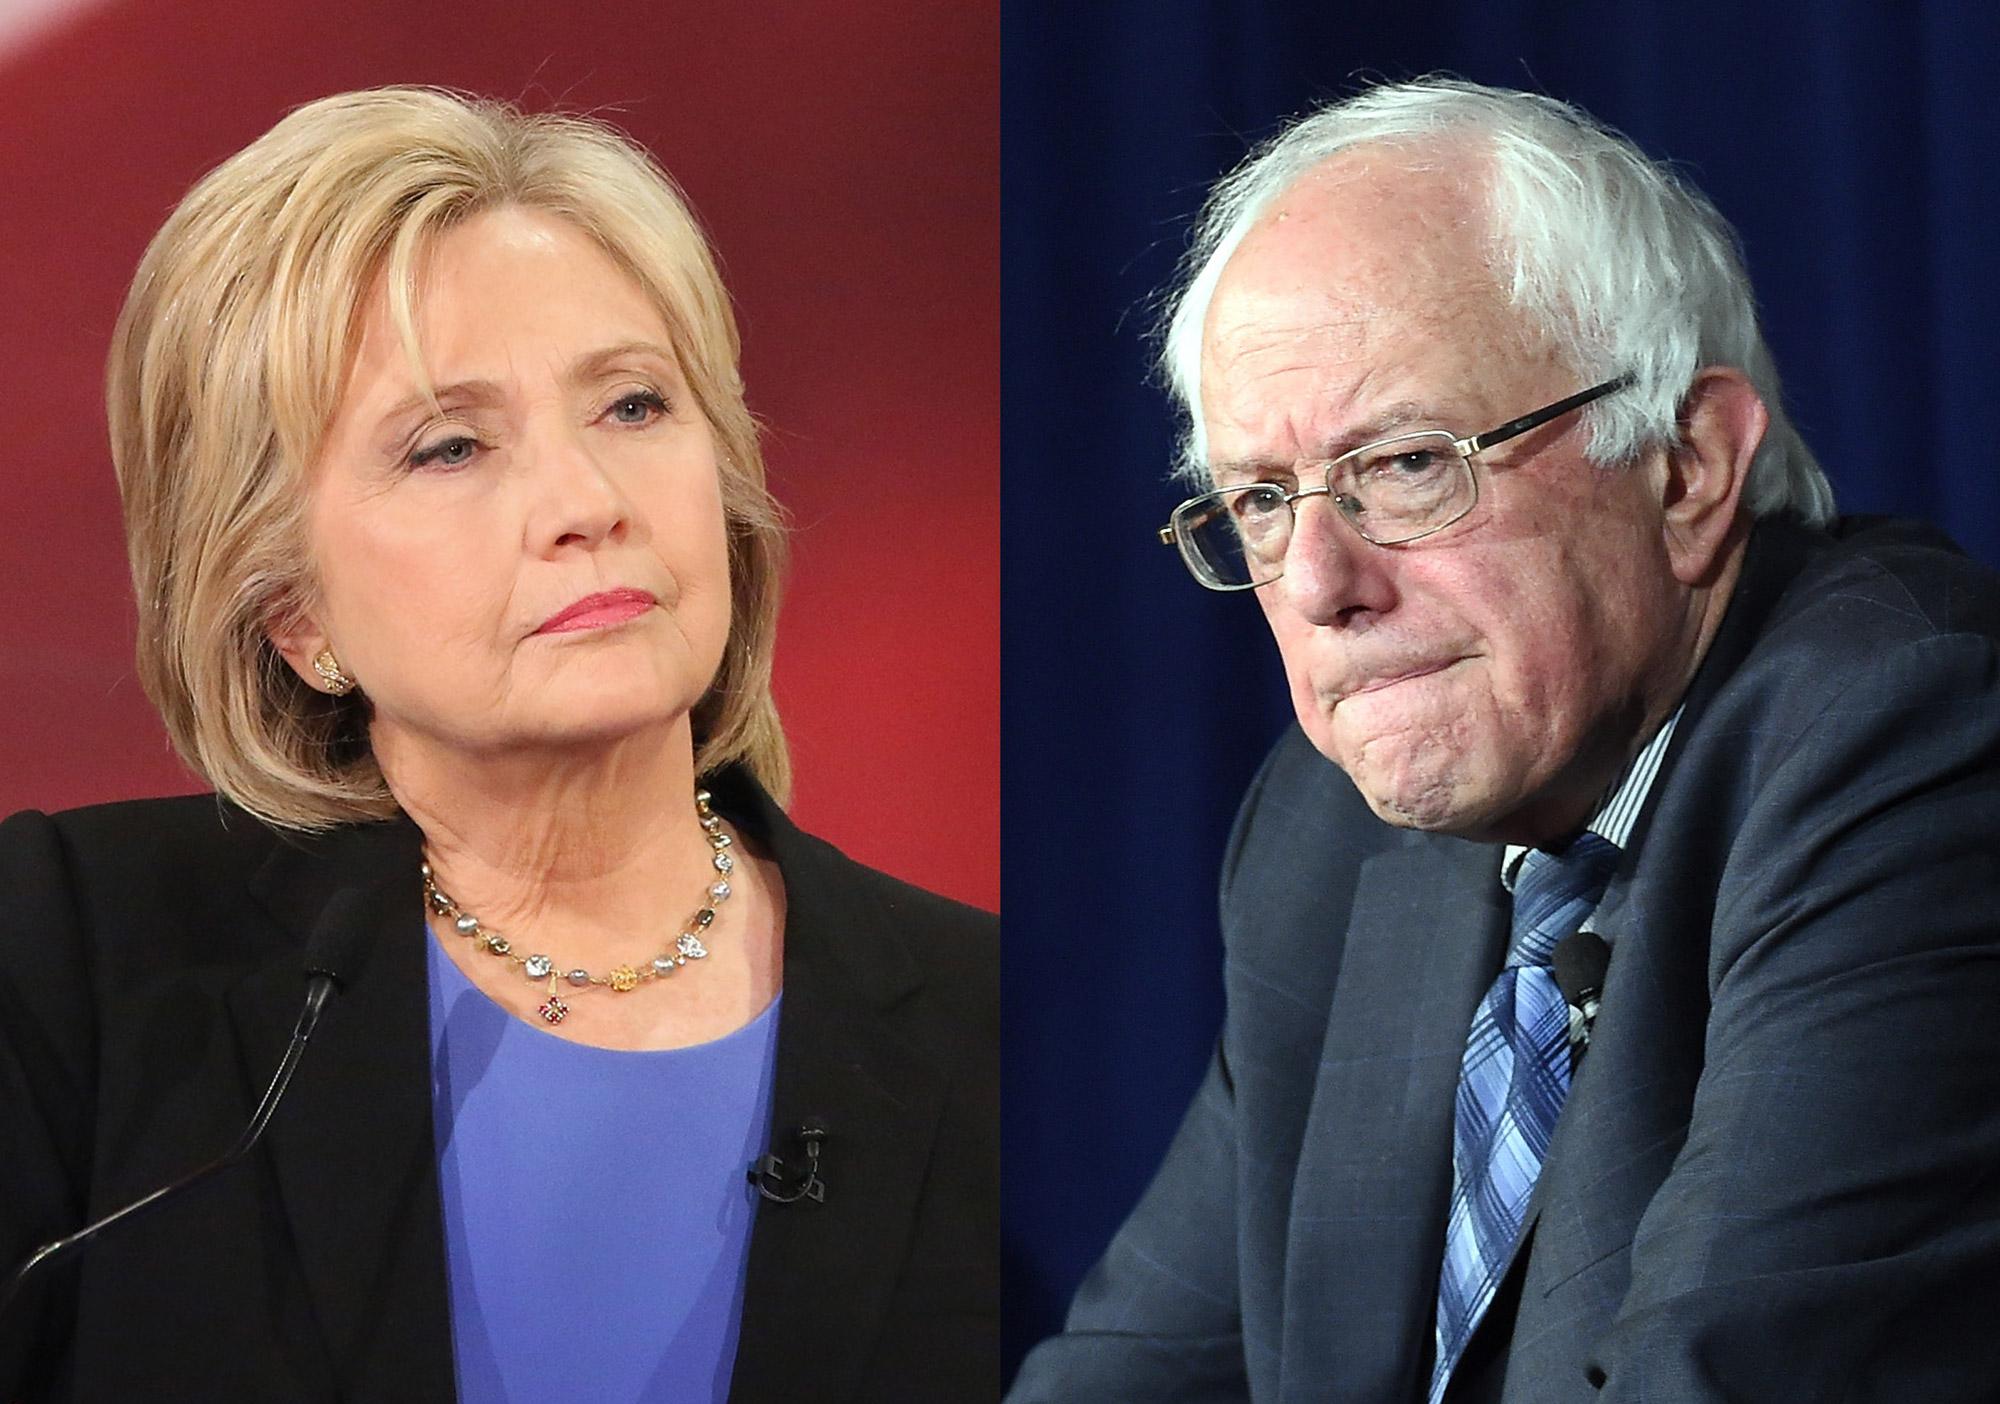 Hillary Clinton  in Charleston, SC on Jan. 17, 2016 (R); Bernie Sanders in Las Vegas, Nevada on Nov. 9, 2015.